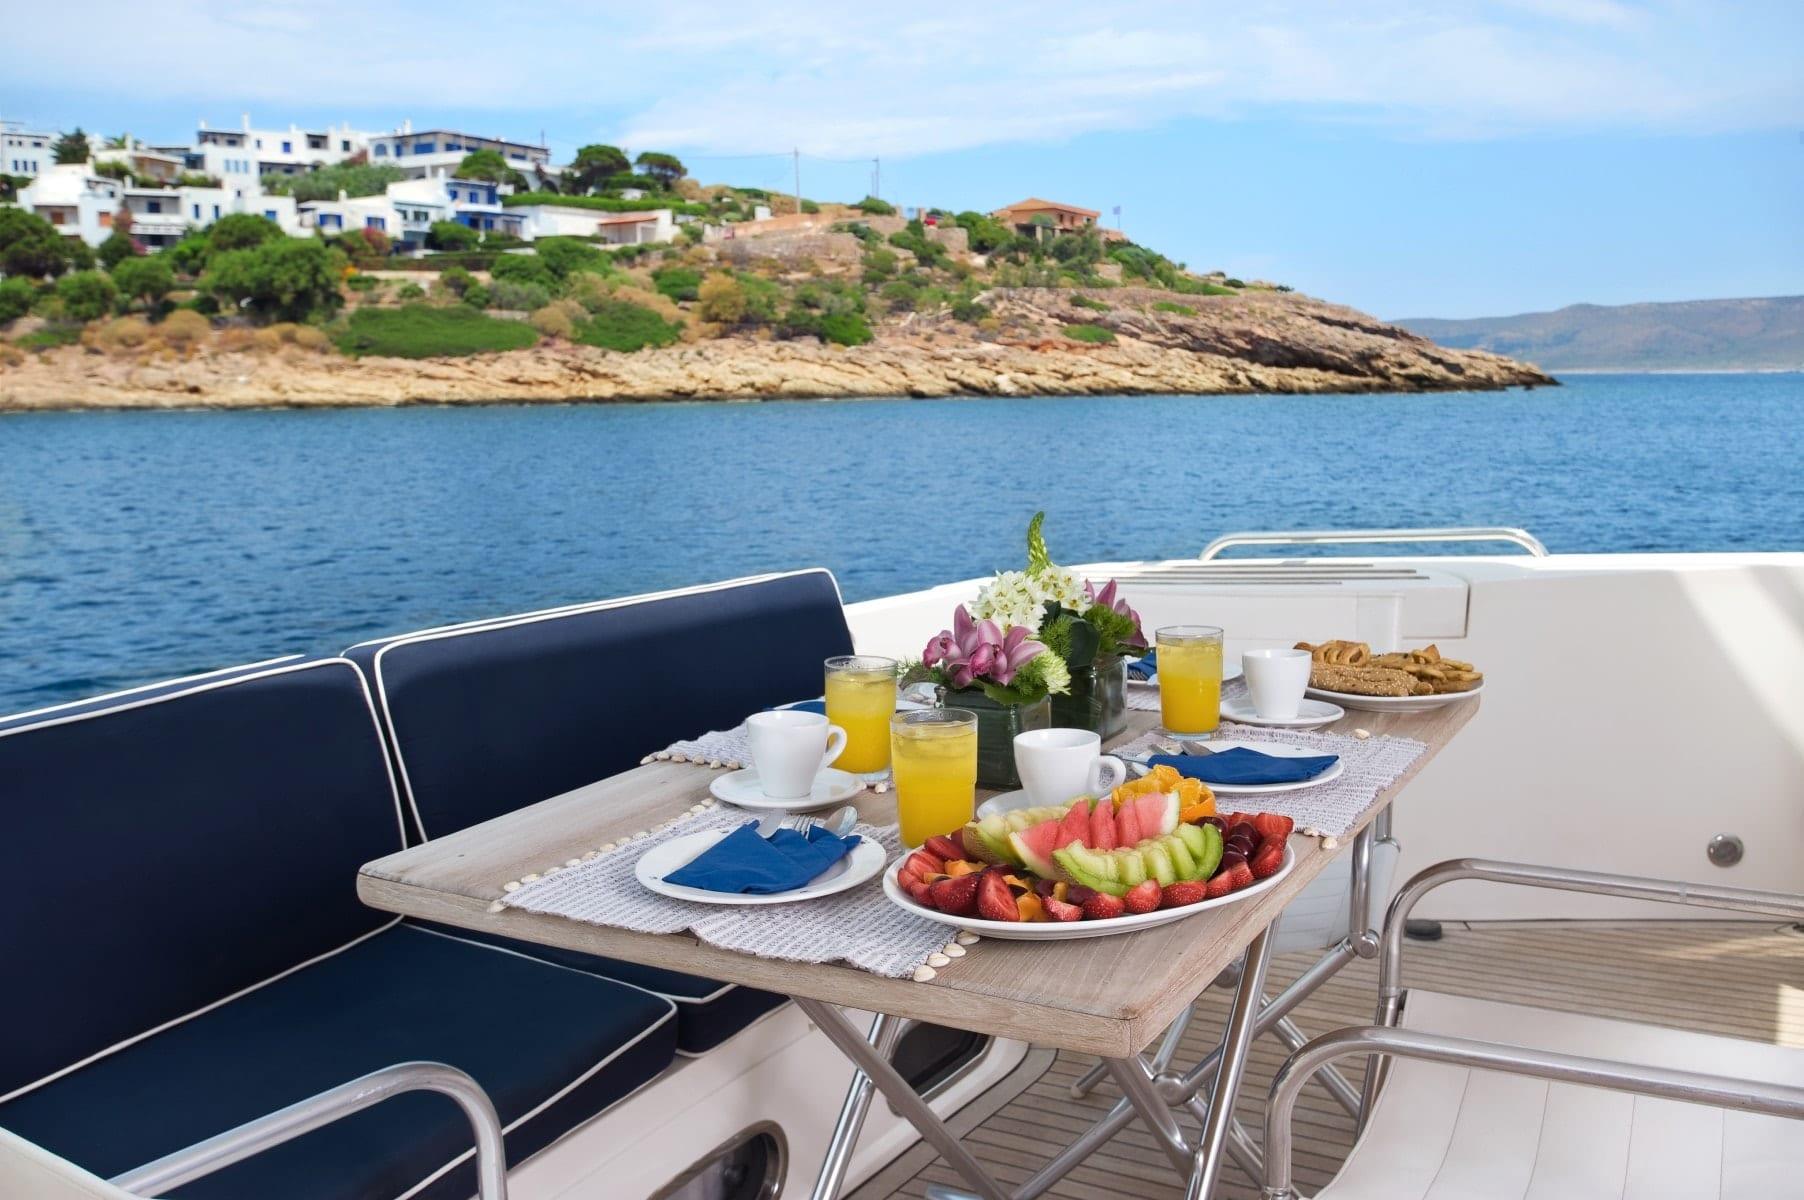 fast break motor yacht aft table (4) min -  Valef Yachts Chartering - 0871